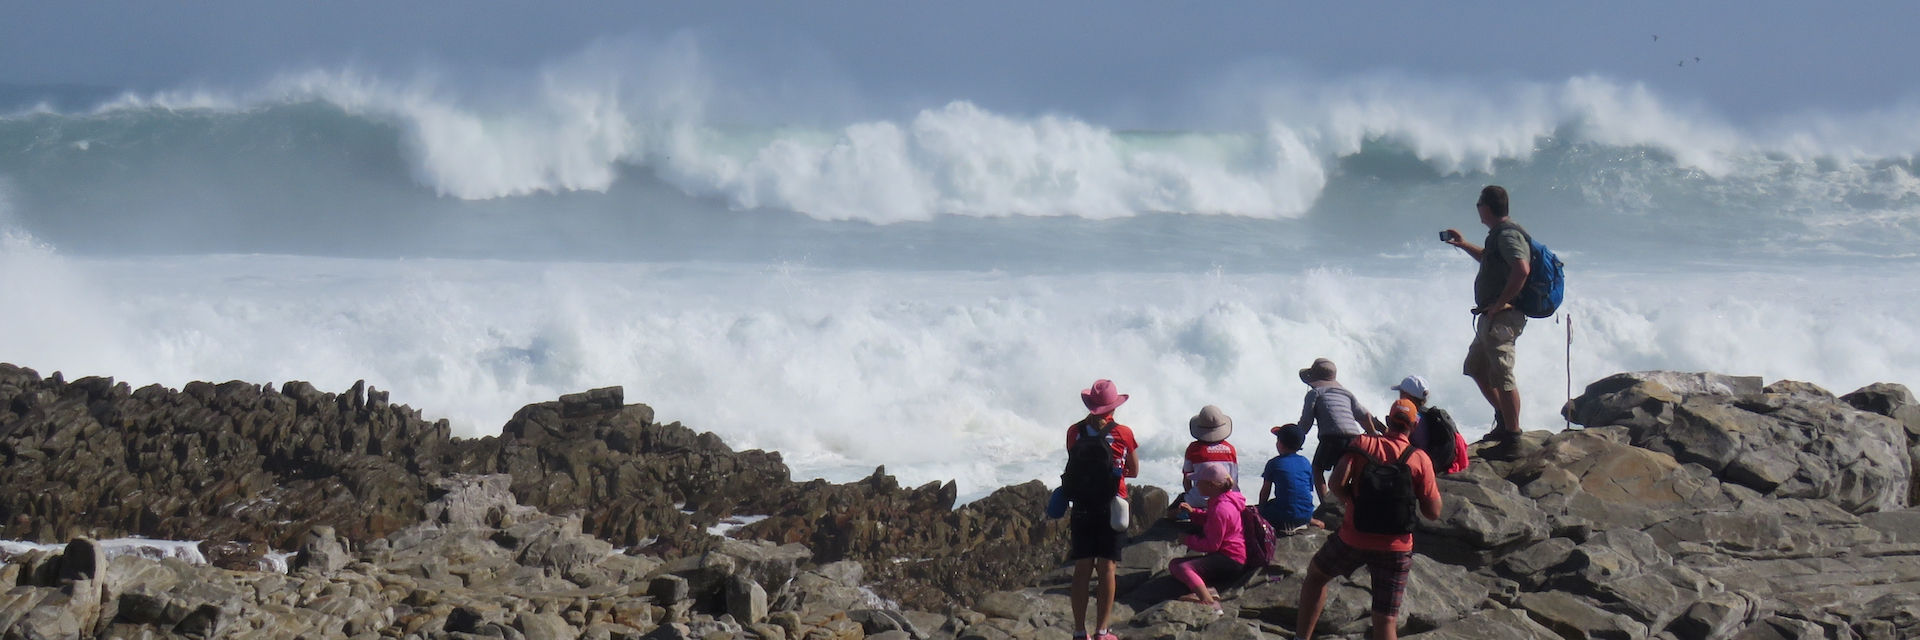 A 3 Big waves 1920x640